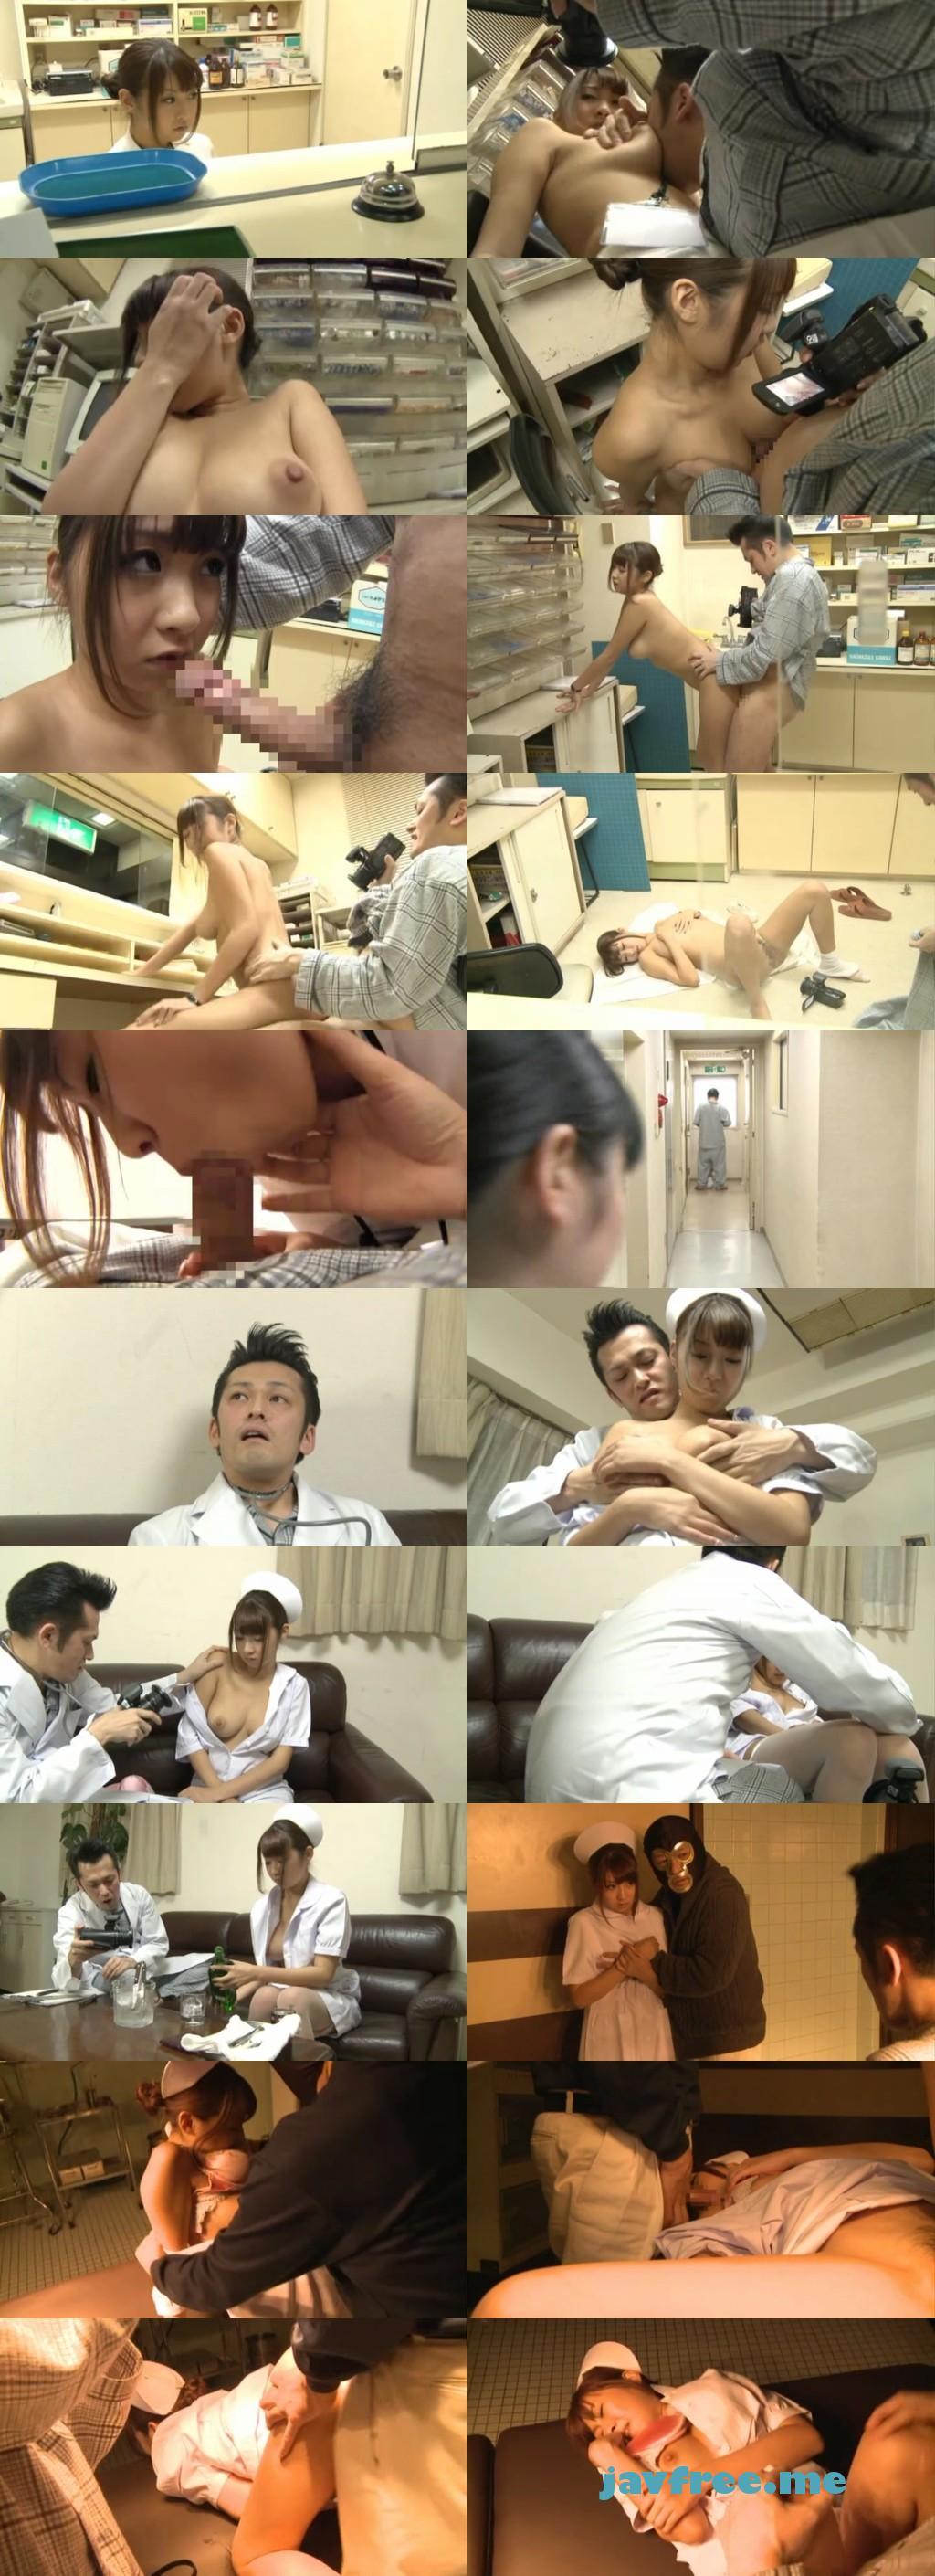 [KNCS 028] ザ・リアル映像 服従『中出し看護婦』 北川瞳 北川瞳 kncr